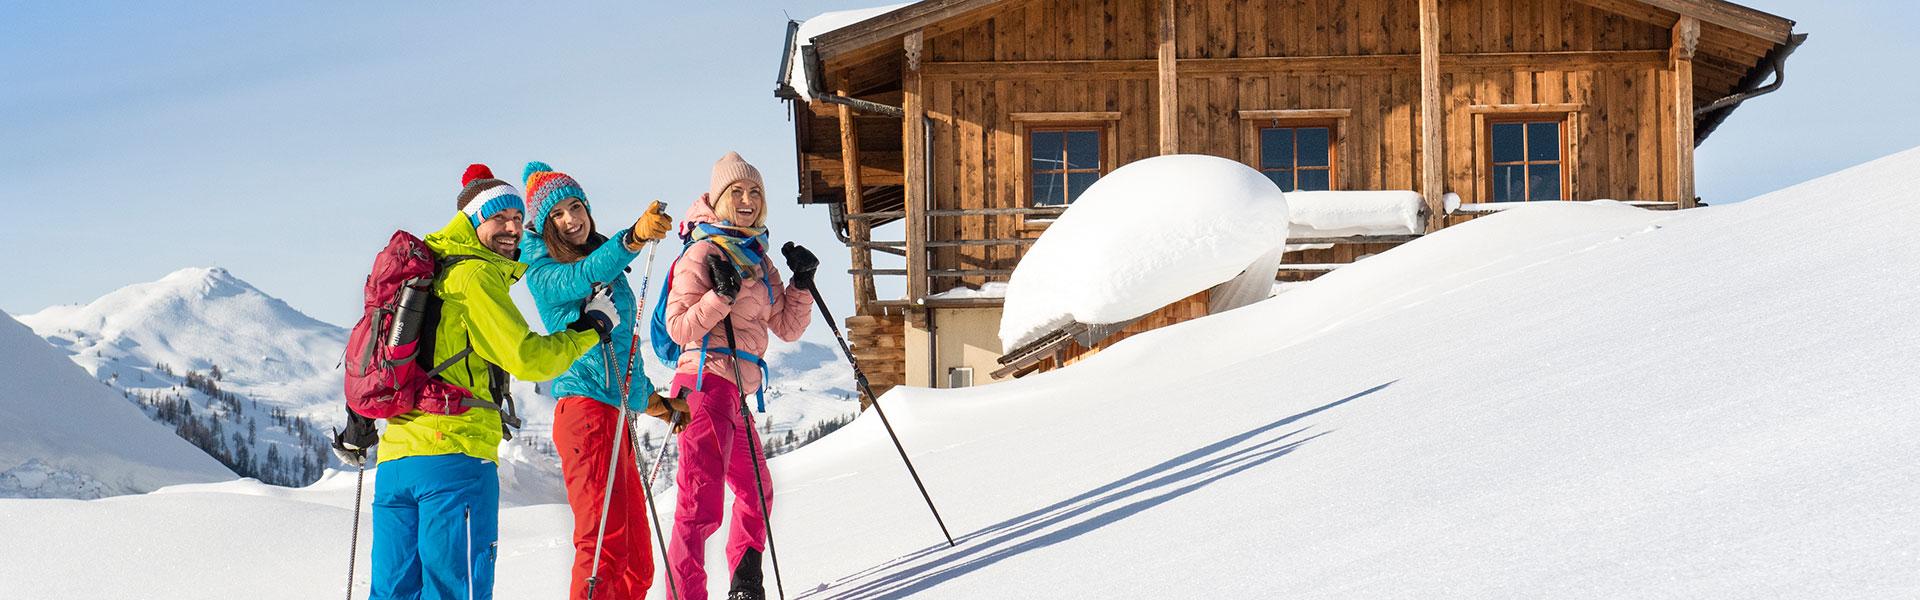 Winterurlaub & Skiurlaub in Flachau, Ski amadé